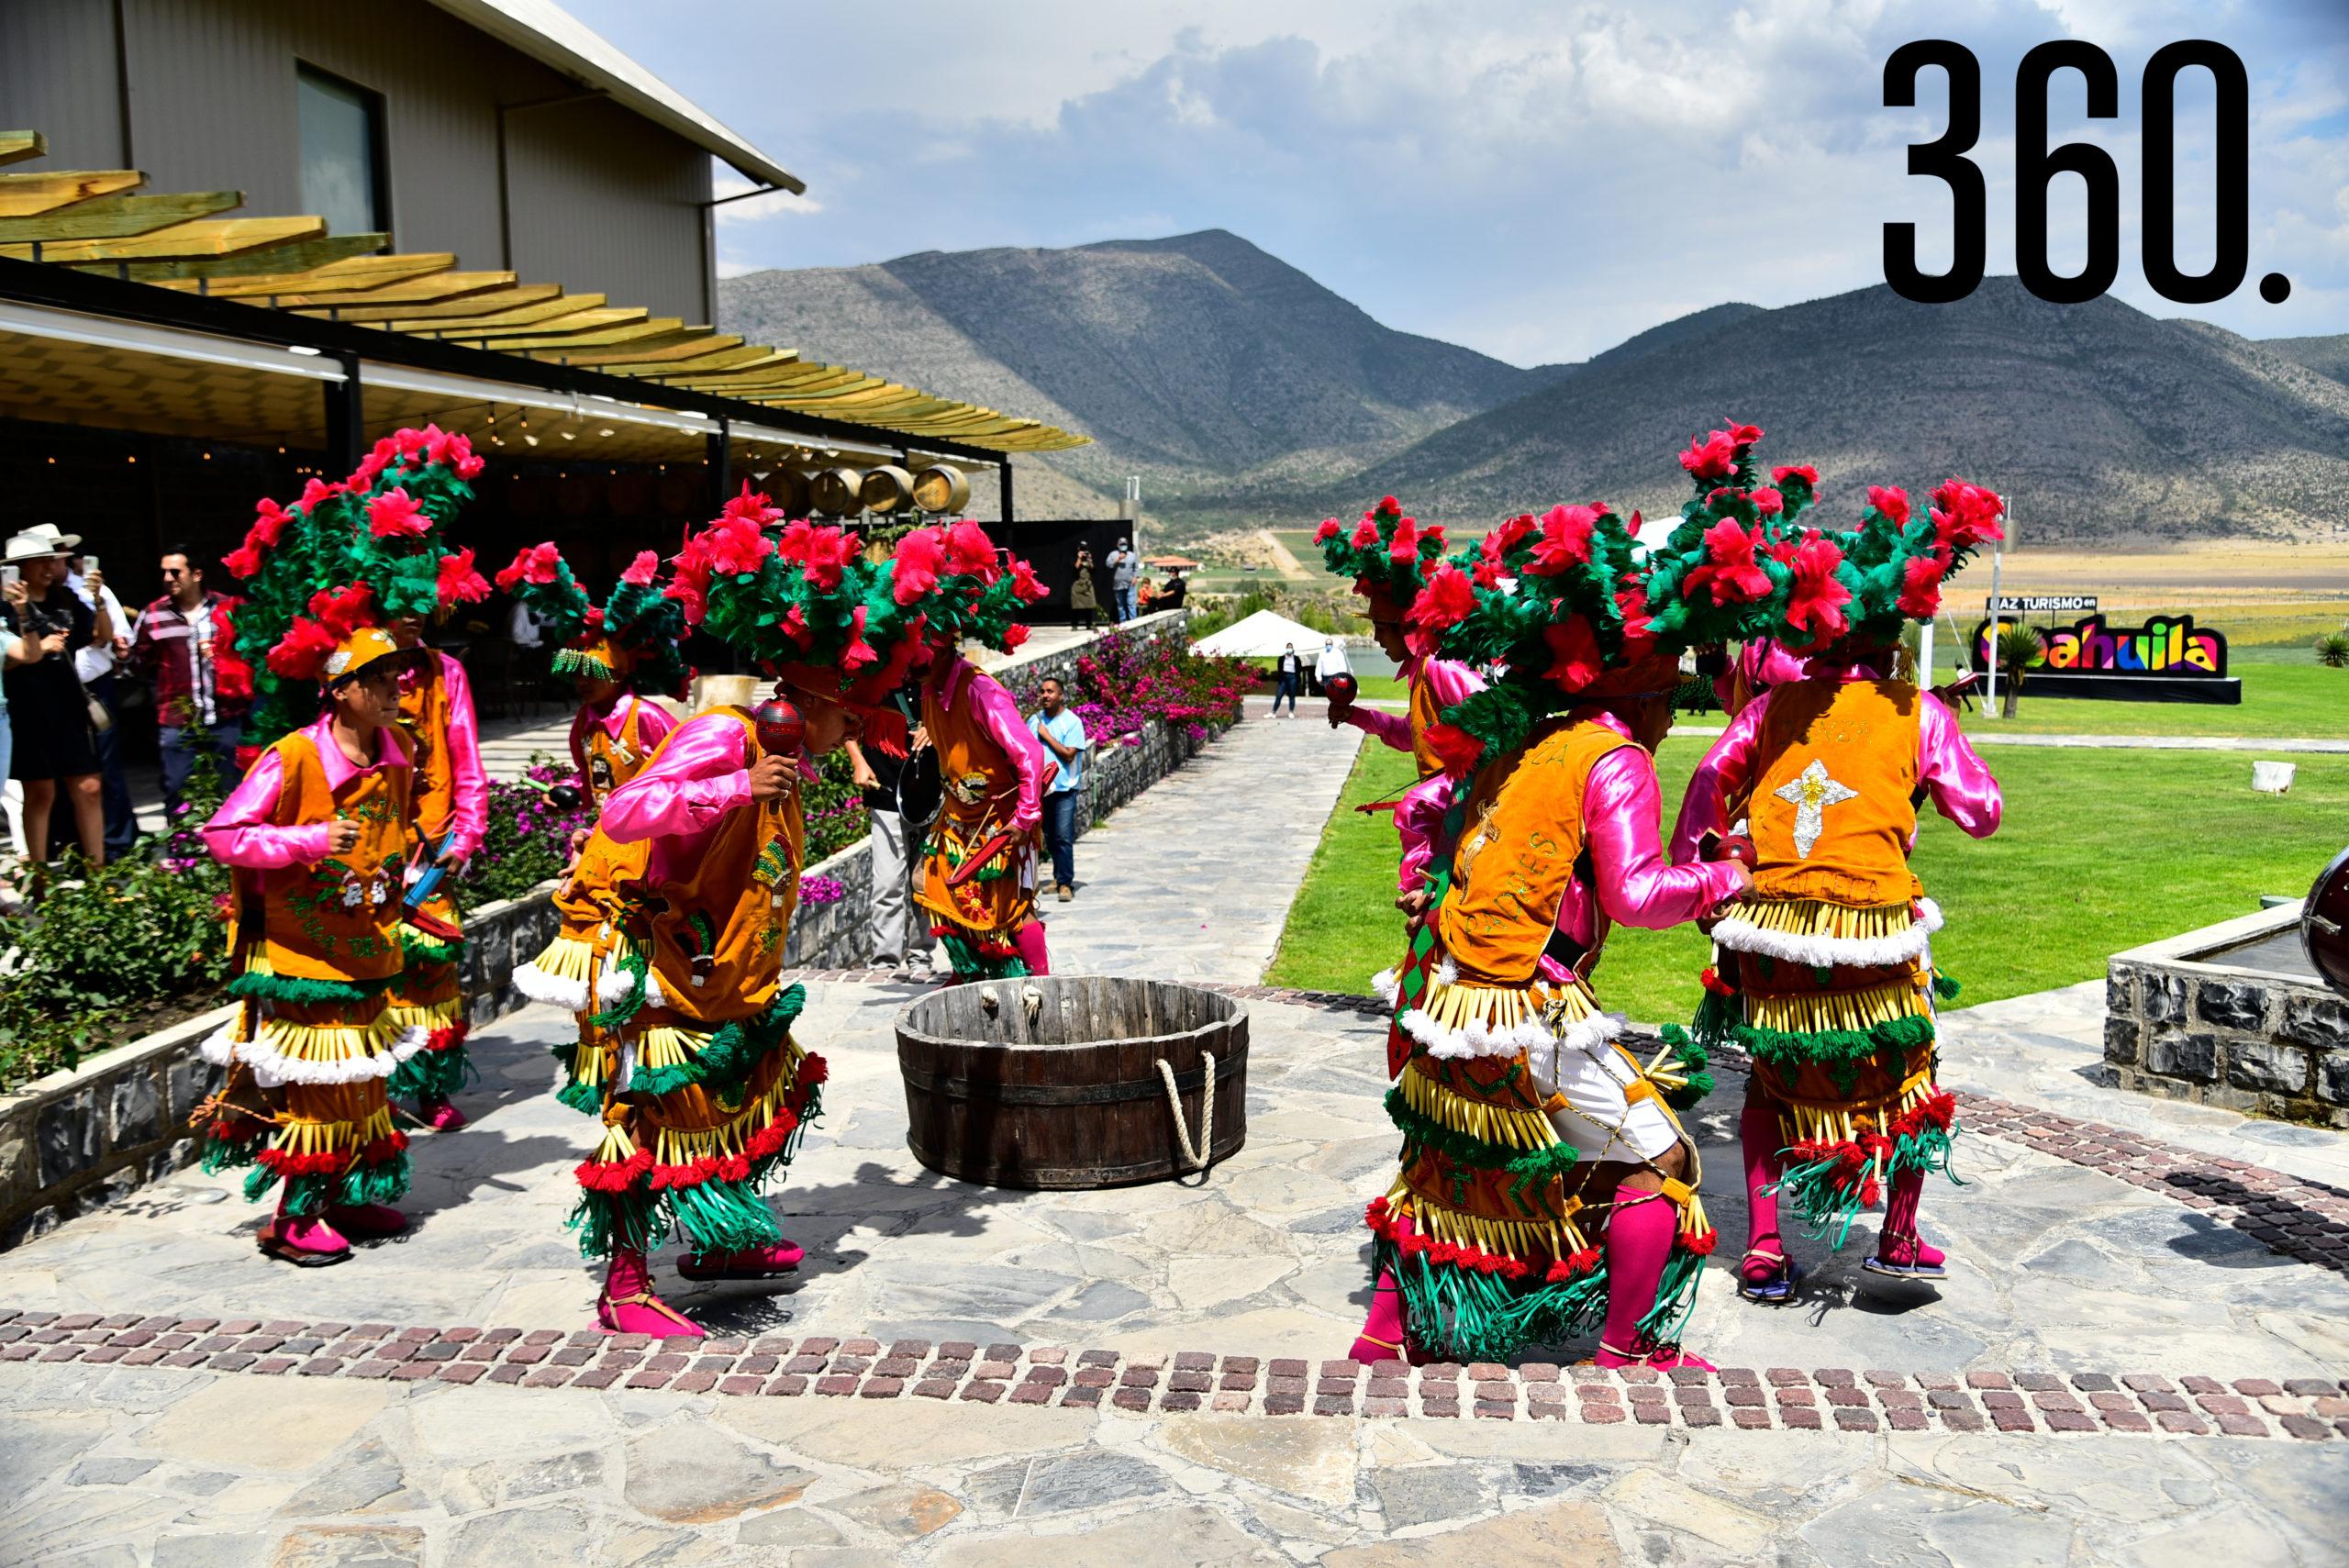 Danza tradicional de matachines.